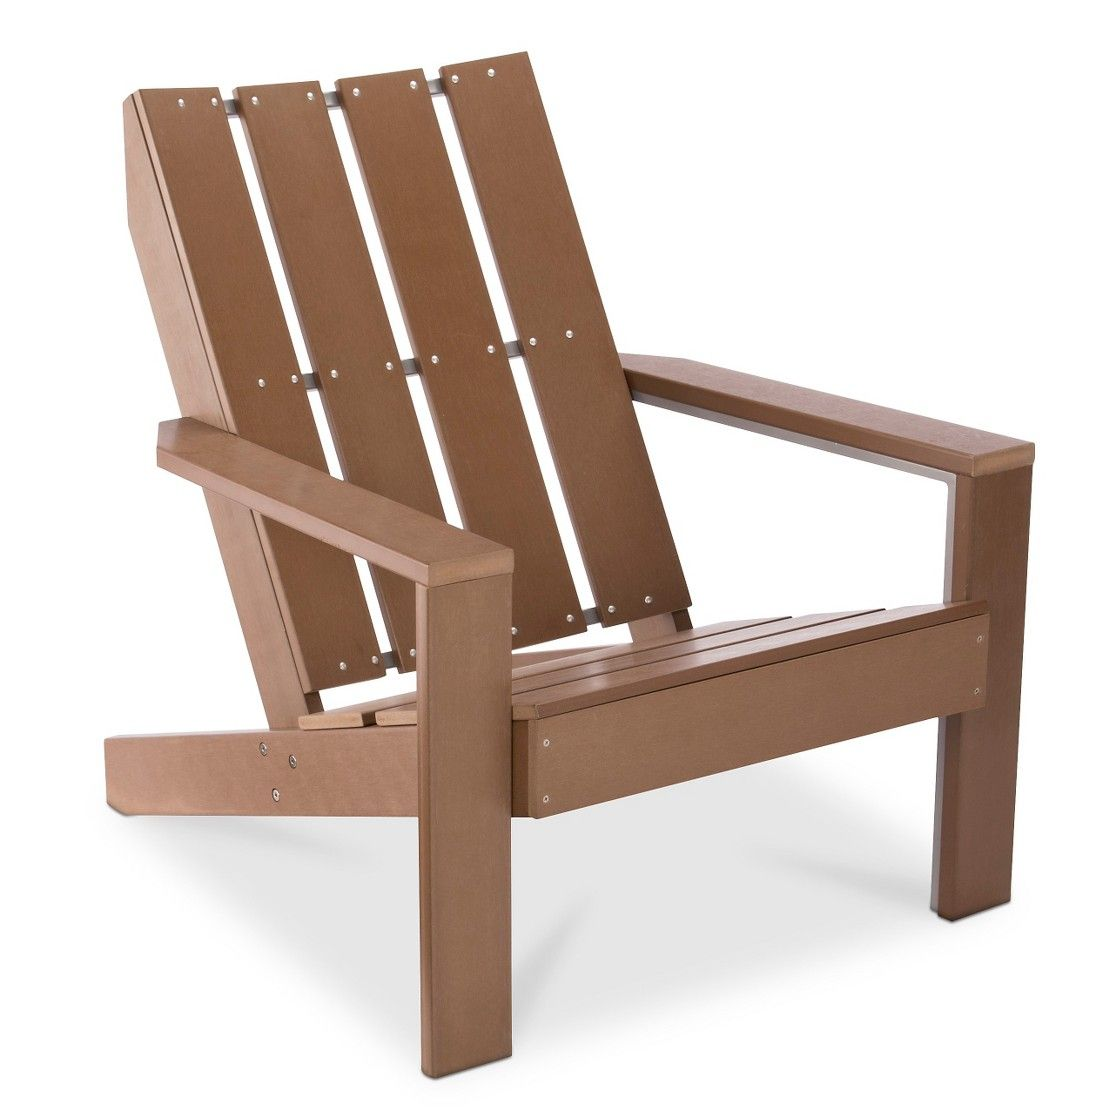 Threshold Bryant Faux Wood Patio Adirondack Chair Adirondack Chairs Patio Wood Patio Adirondack Chair